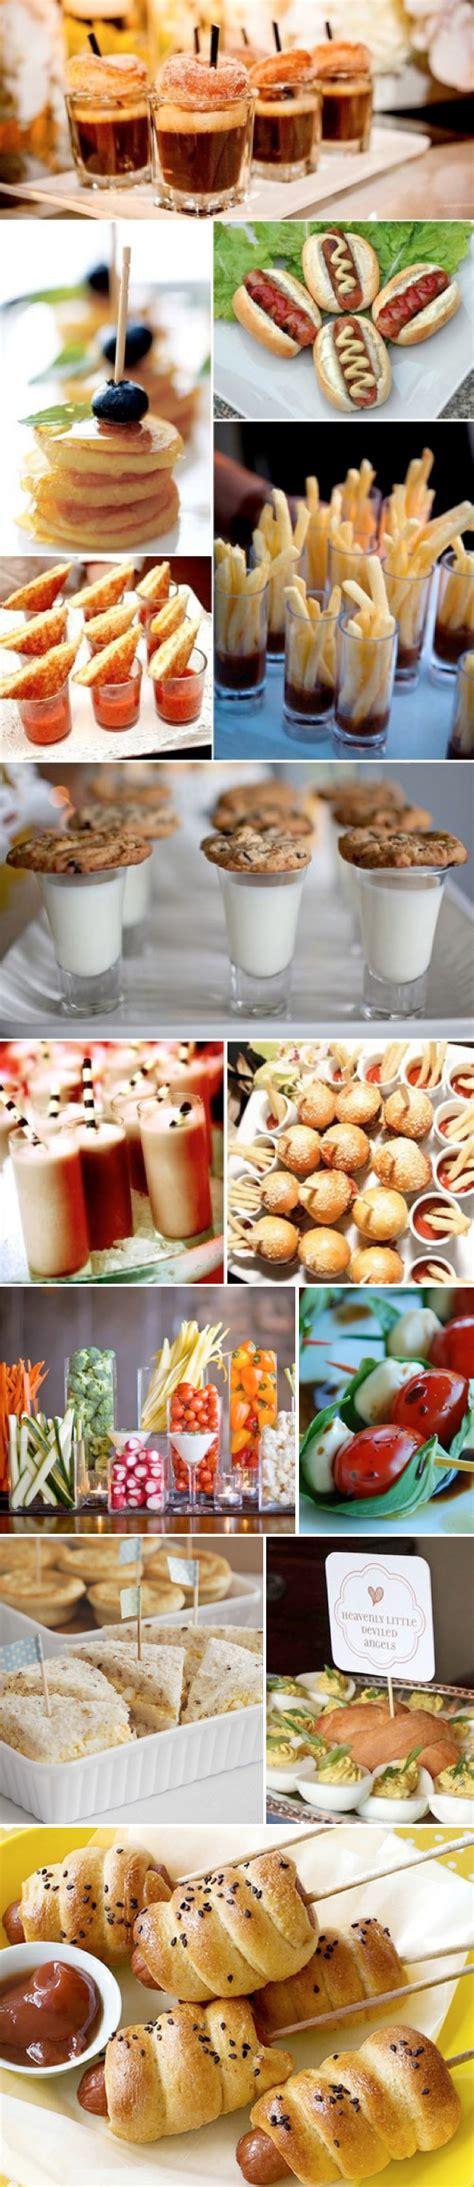 fingerfood für wedding buffet menu ideas